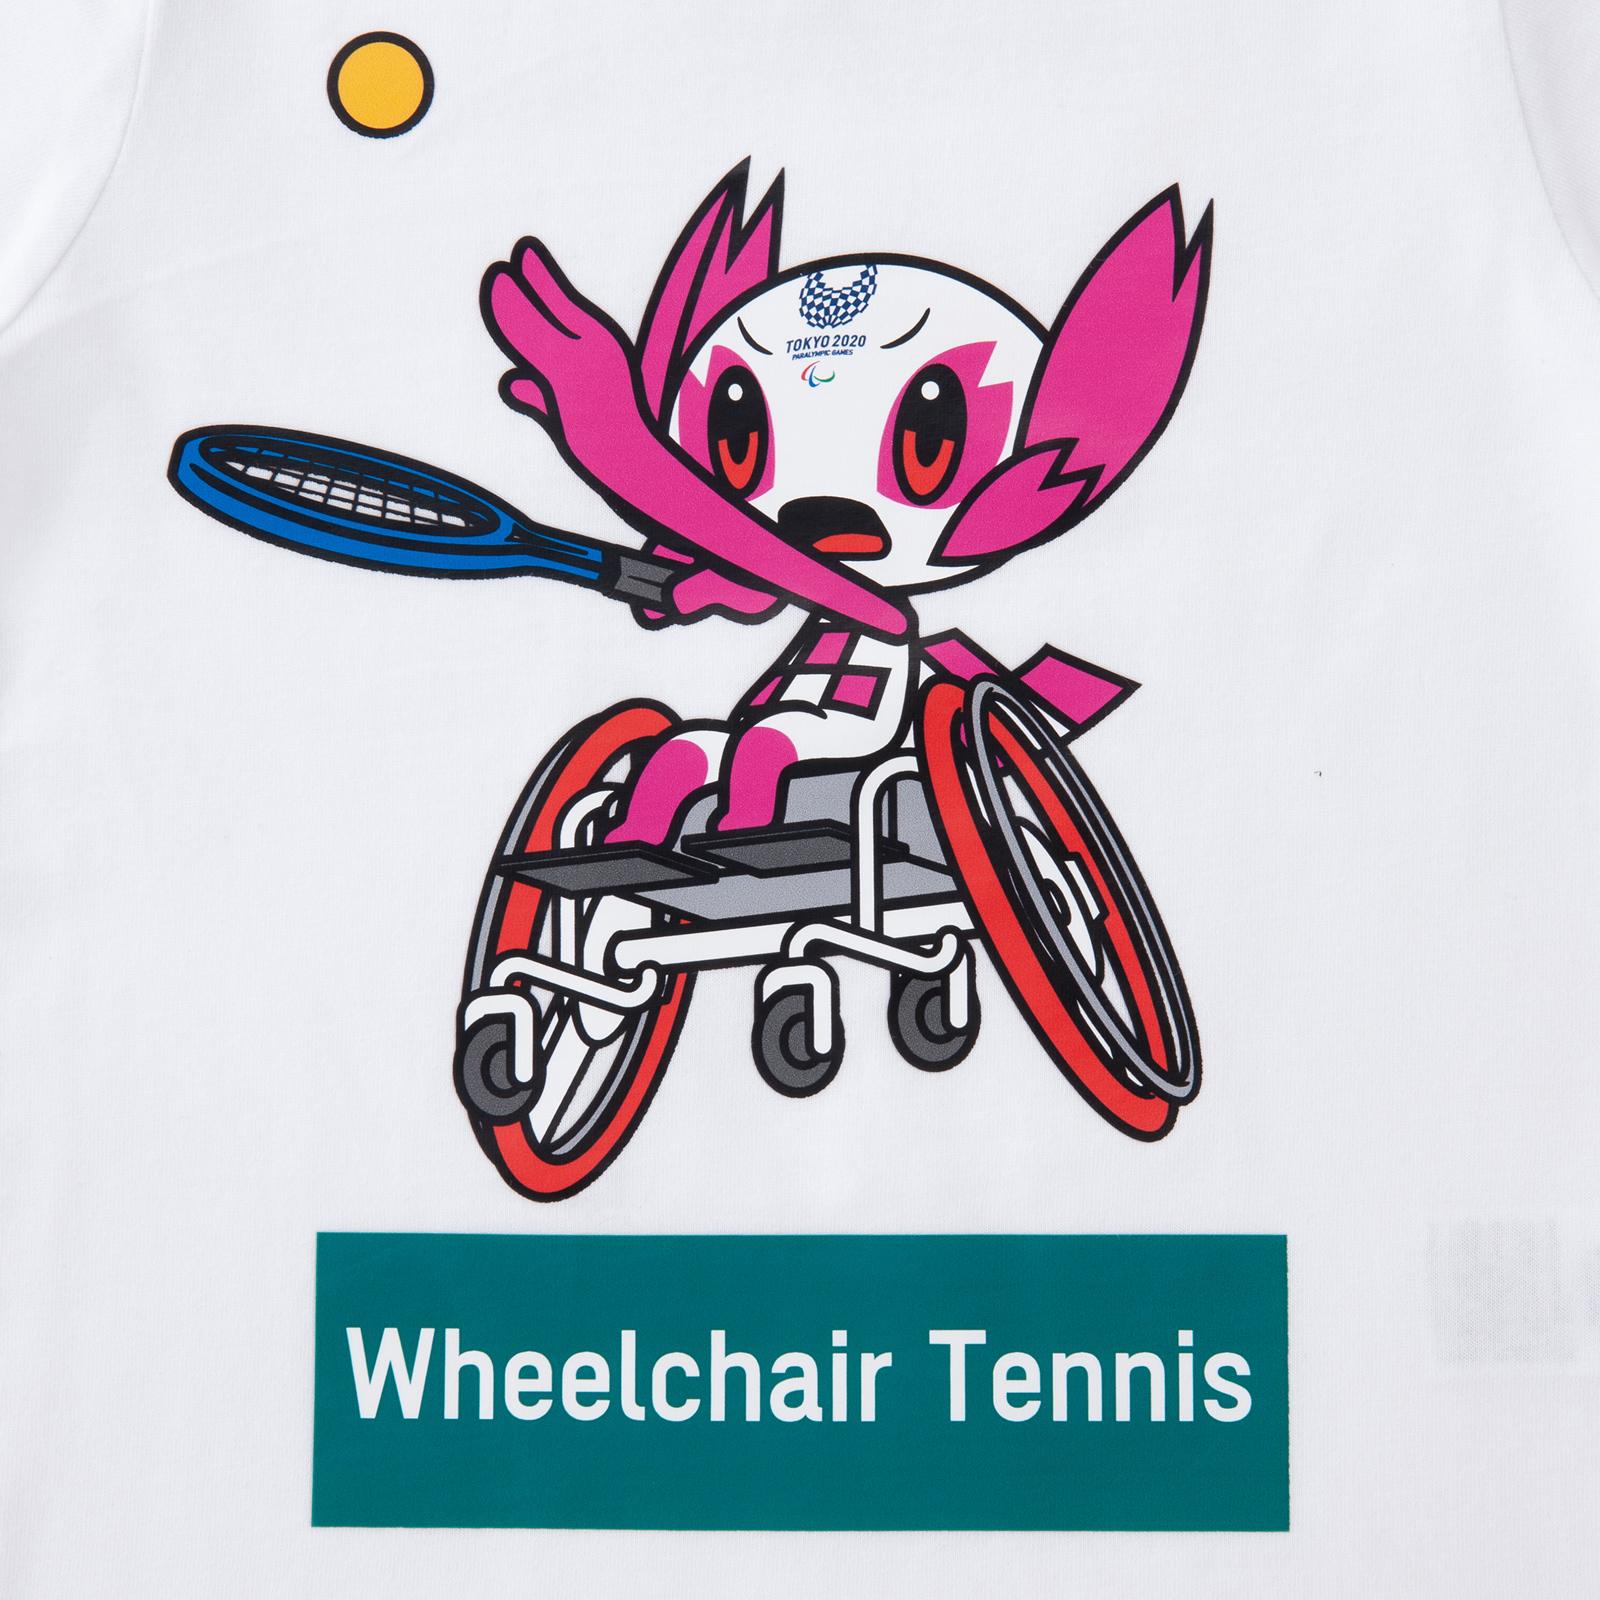 KIDSTシャツ車いすテニス(東京2020パラリンピックマスコット)